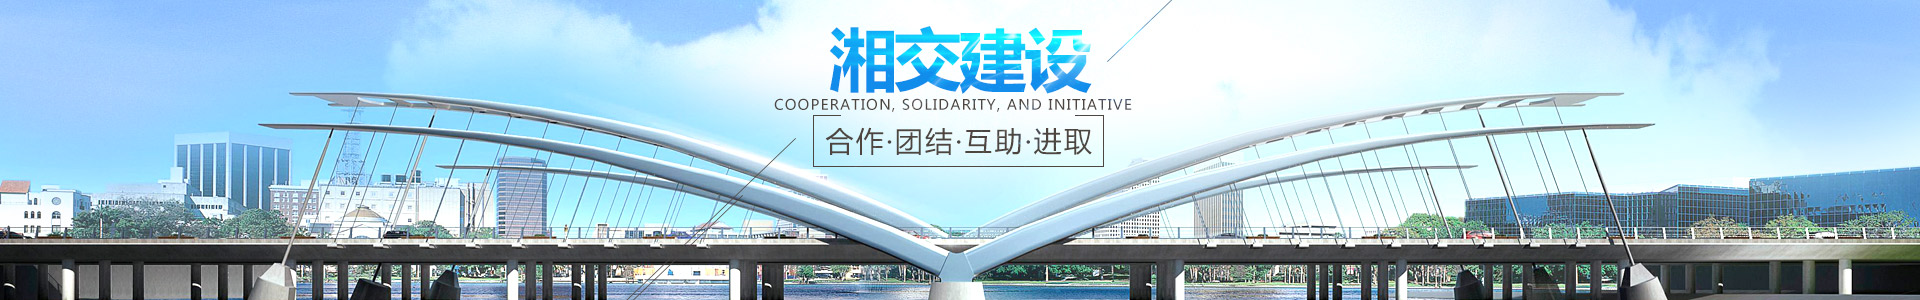 ag娱乐app_湘交建设|公路工程承包|交安工程承包